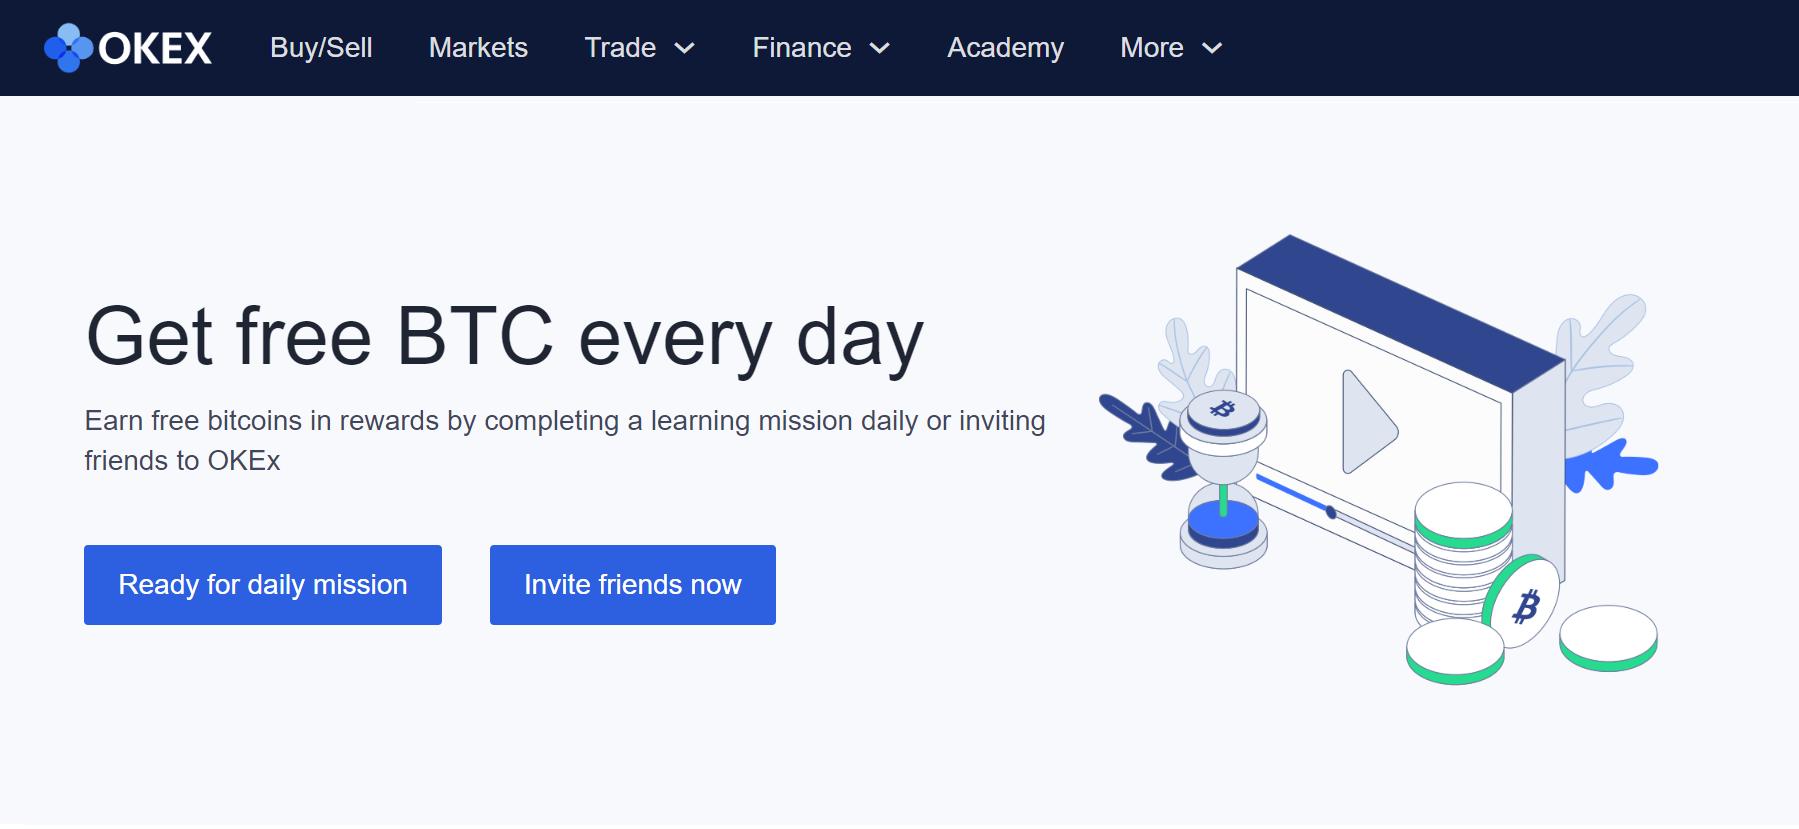 「OKEX」簡単な学習ミッションで毎日ビットコインをもらおう!